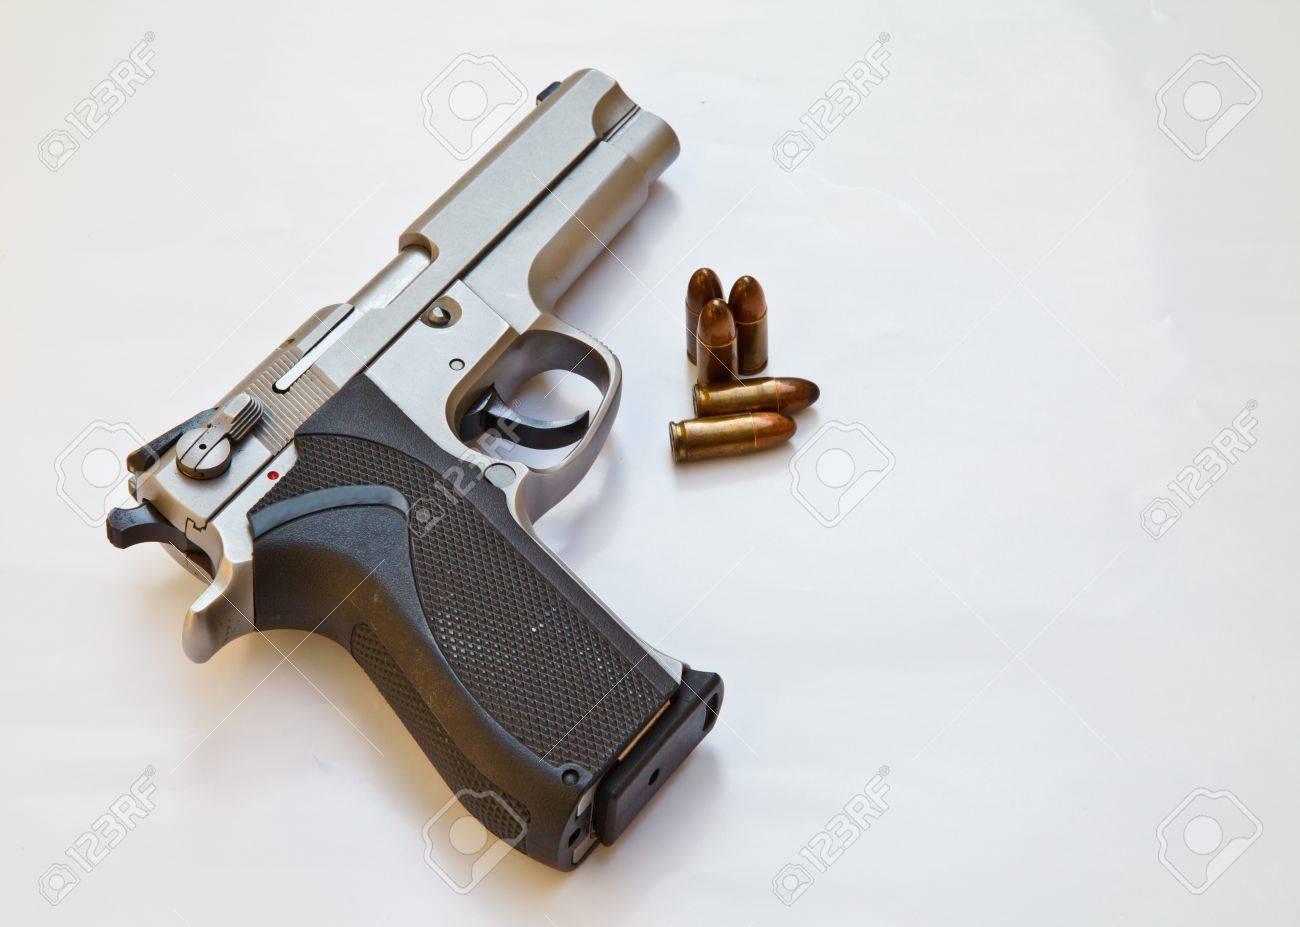 Semi-automatic pistol and bullets Stock Photo - 17113096